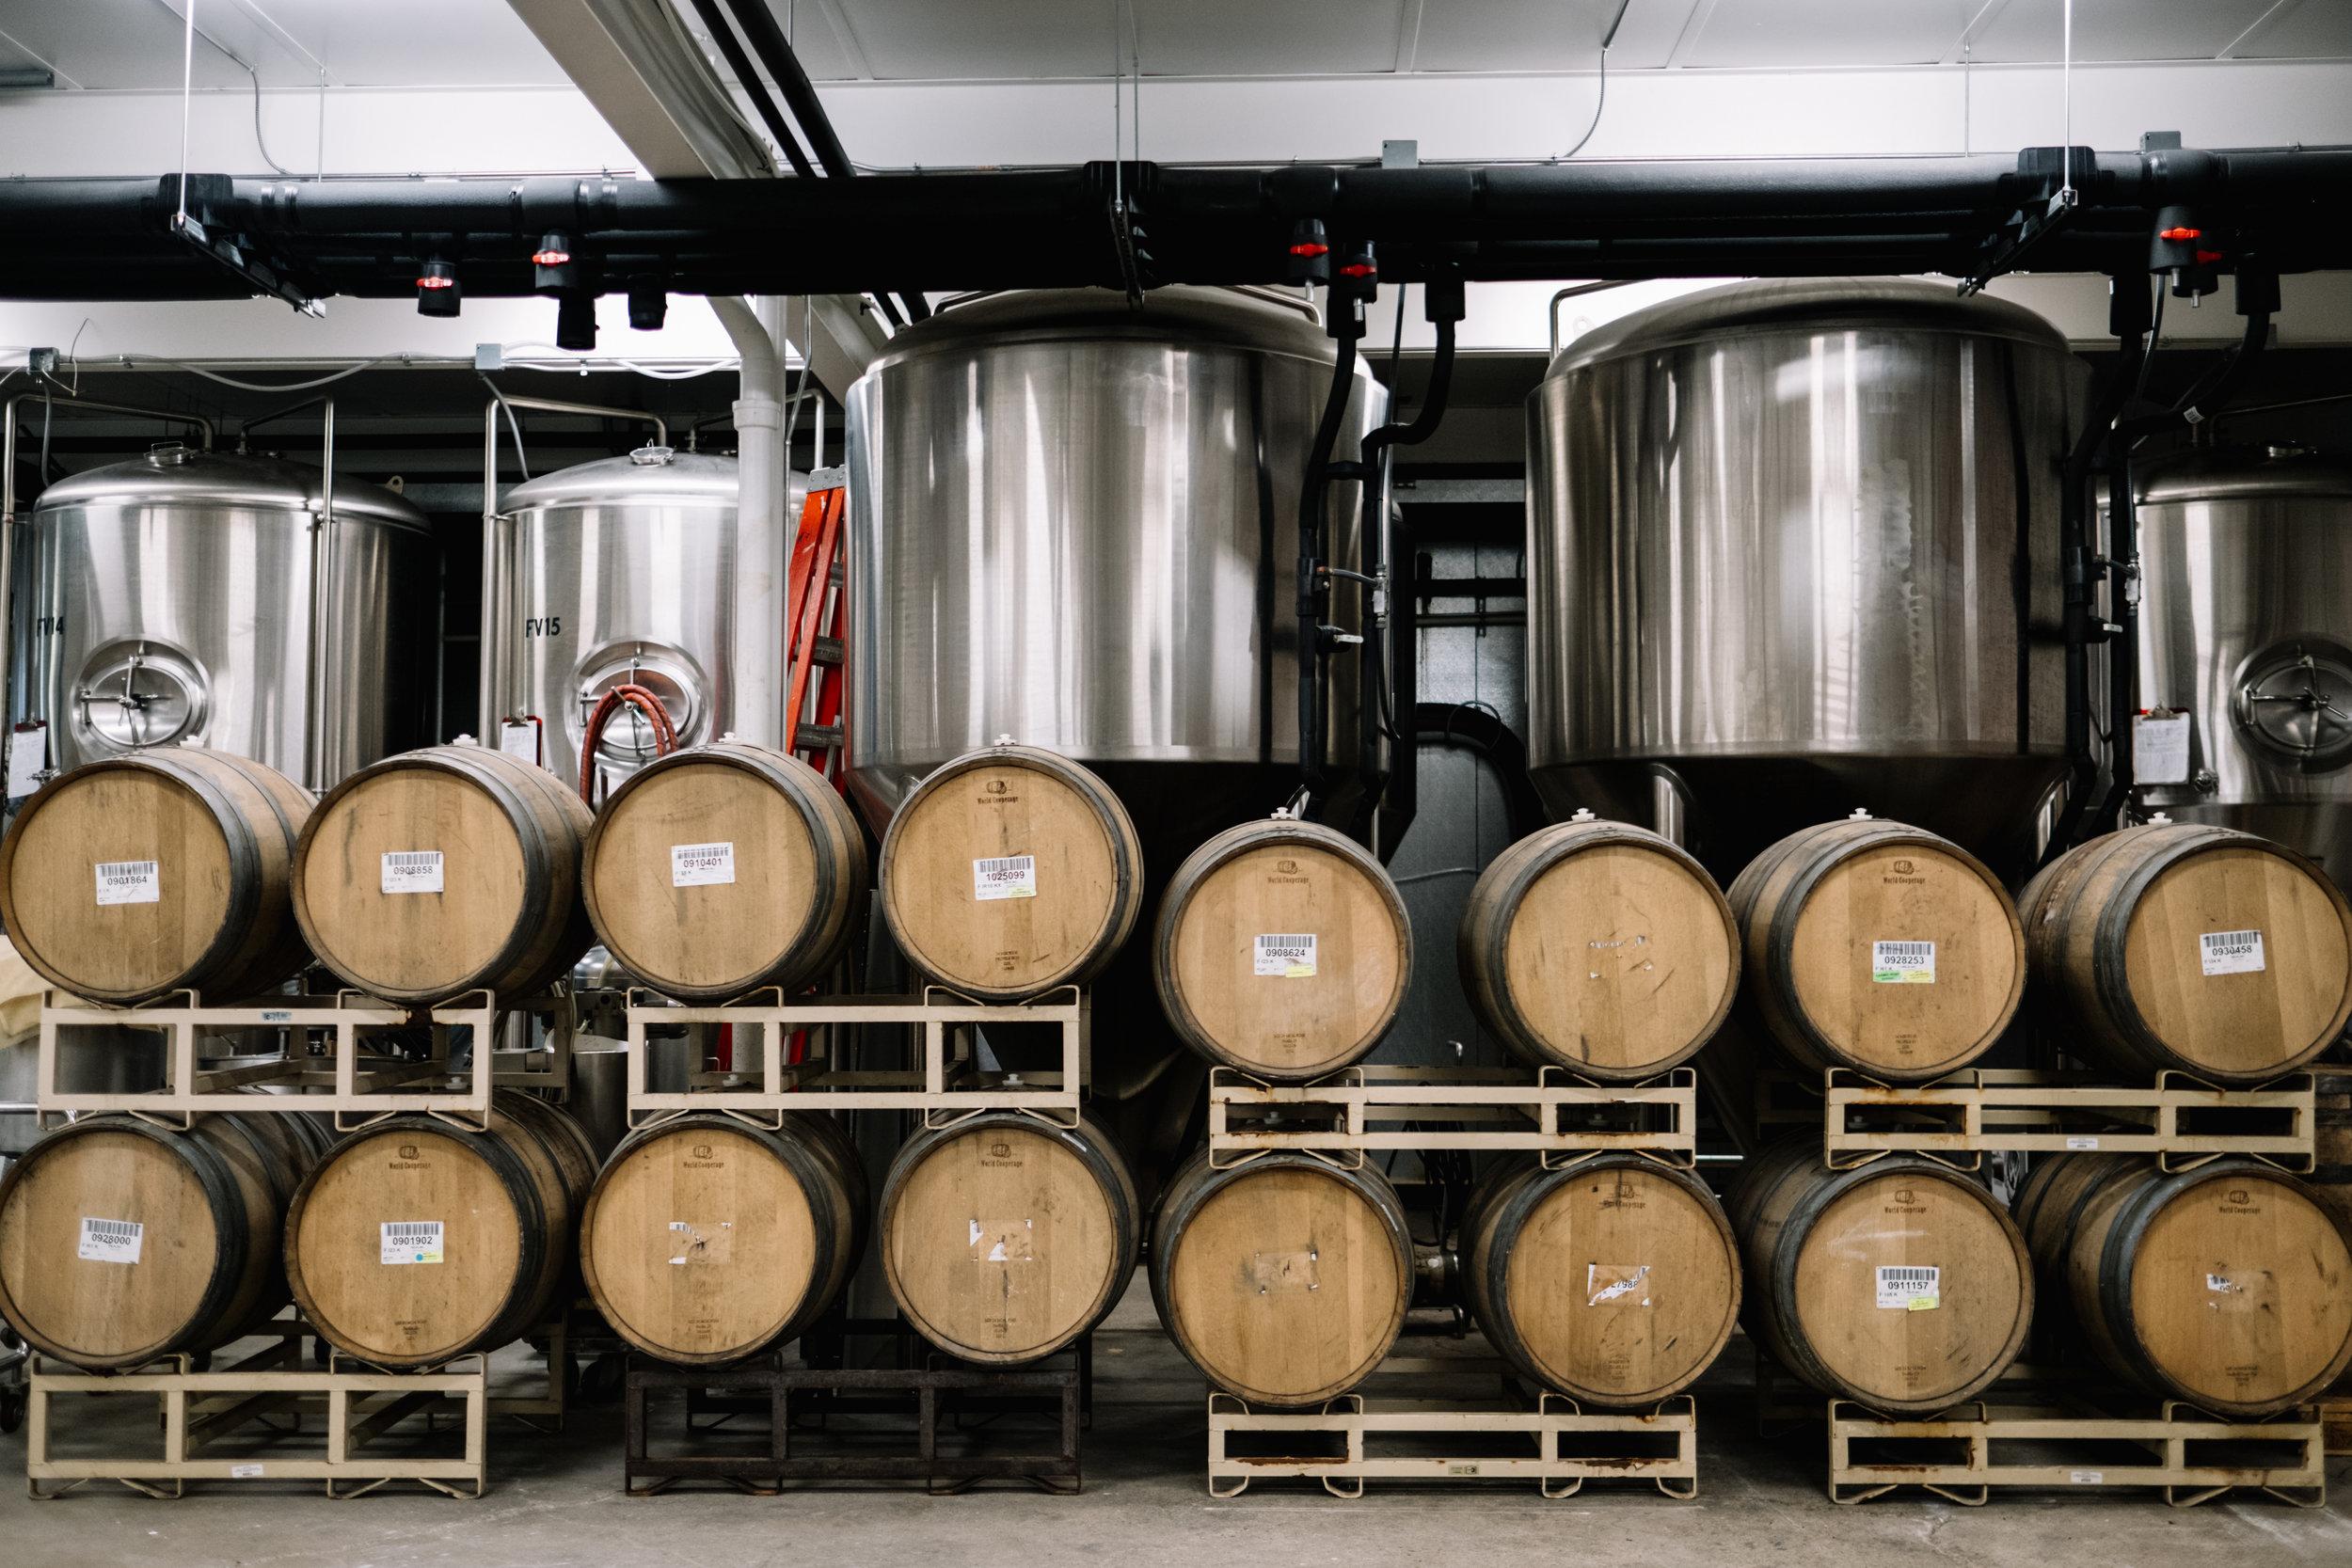 Copy of Bourbon Barrel Aged